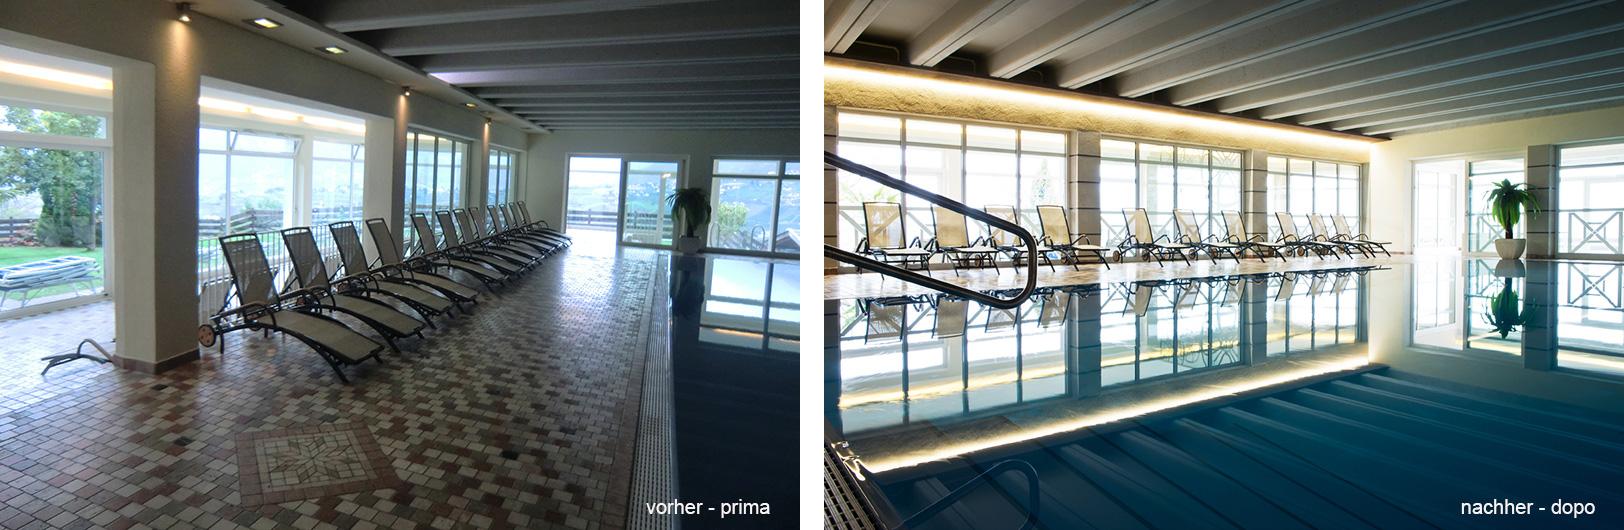 Hallenbad | piscina coperta